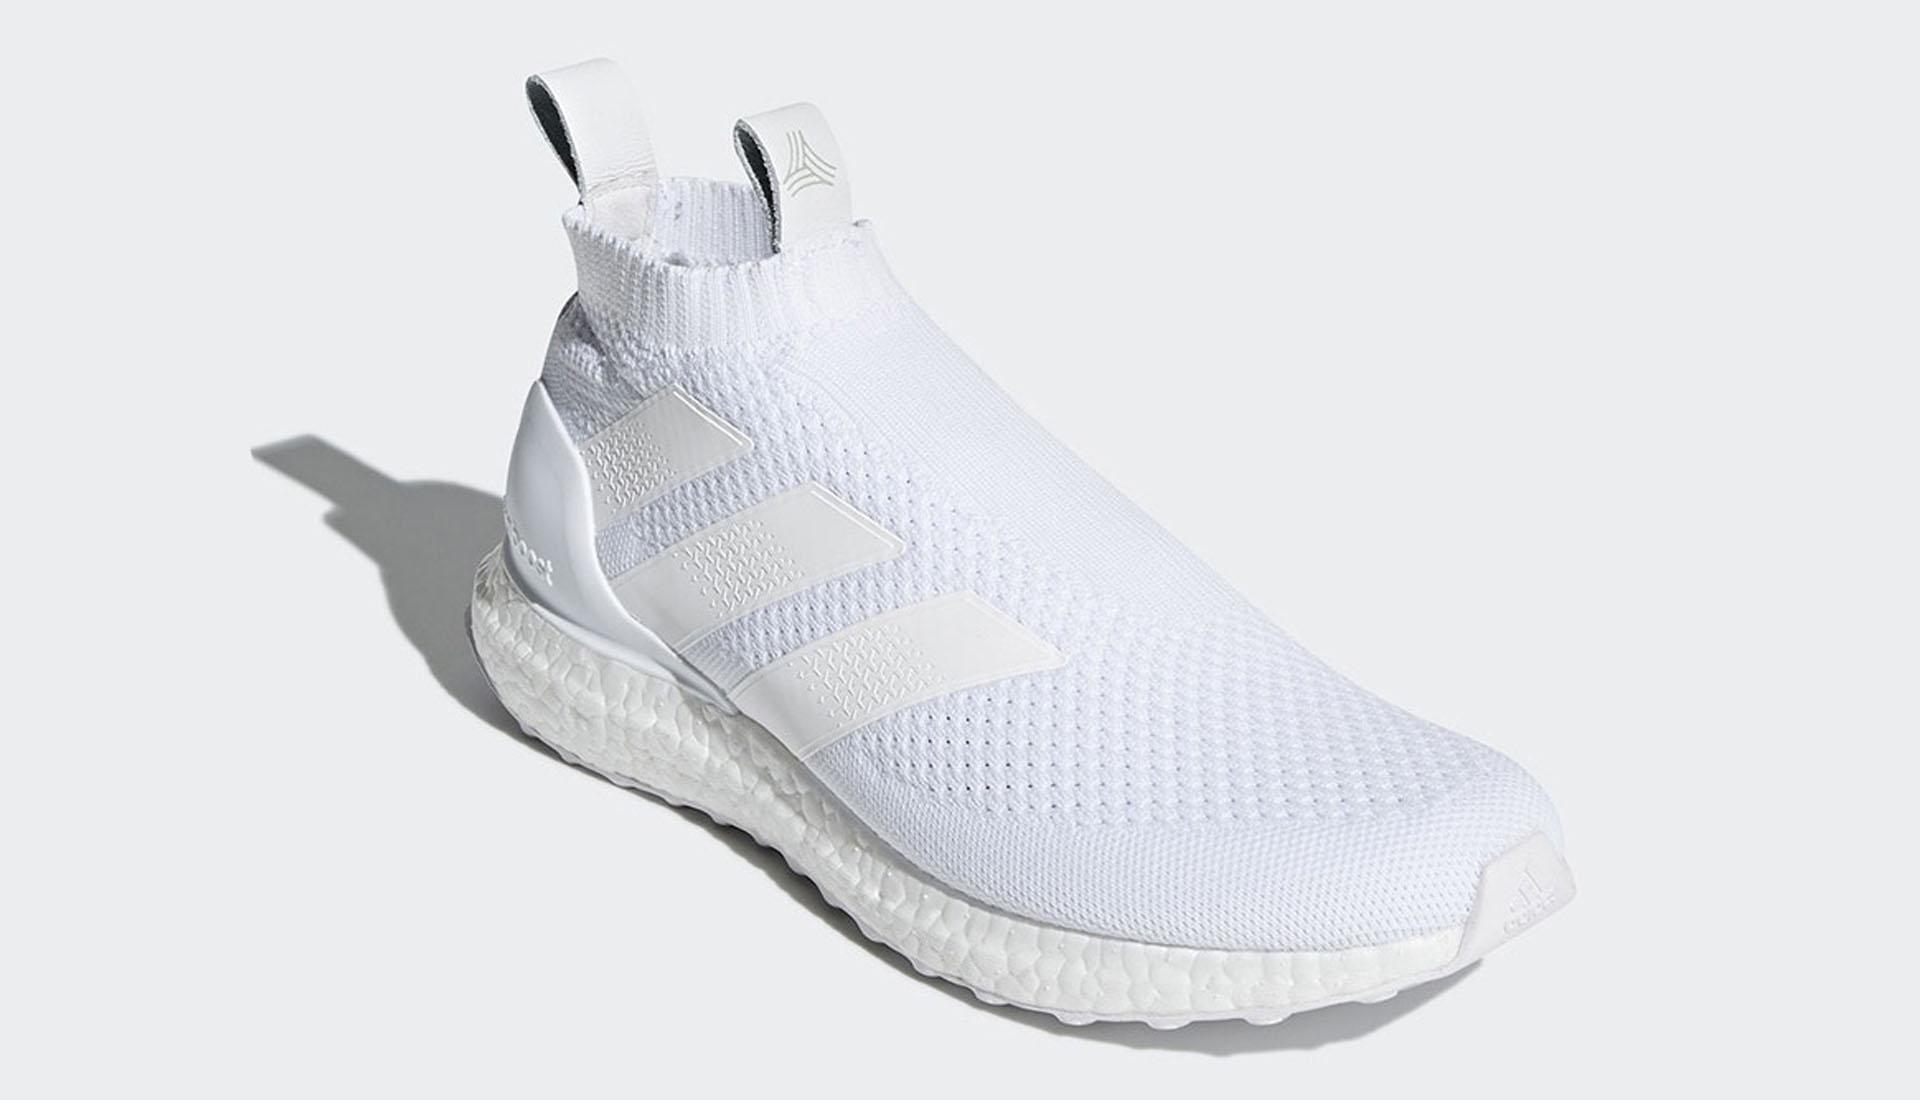 adidas-ace-ultraboost-multi-1-min.jpg